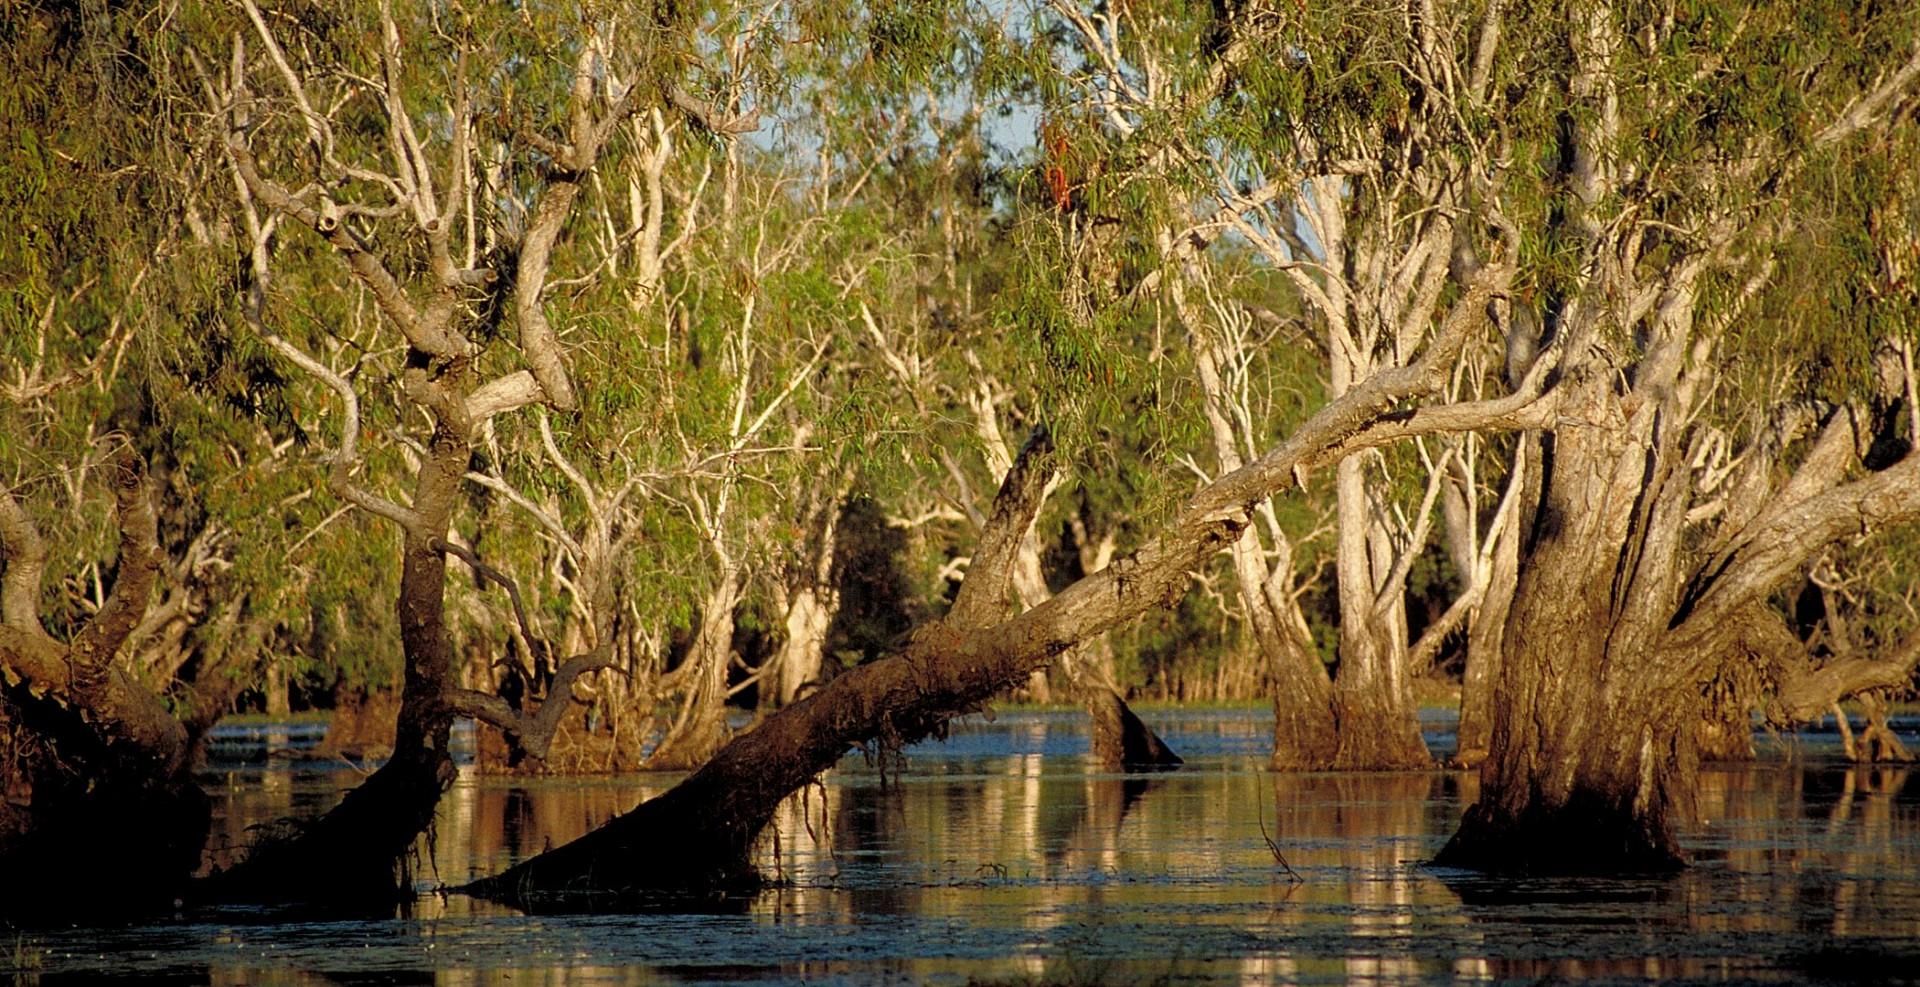 Reportage-Fotograf-in-Paris-Reportage-Fotografie-Mangroven-Wälder-in-Australien